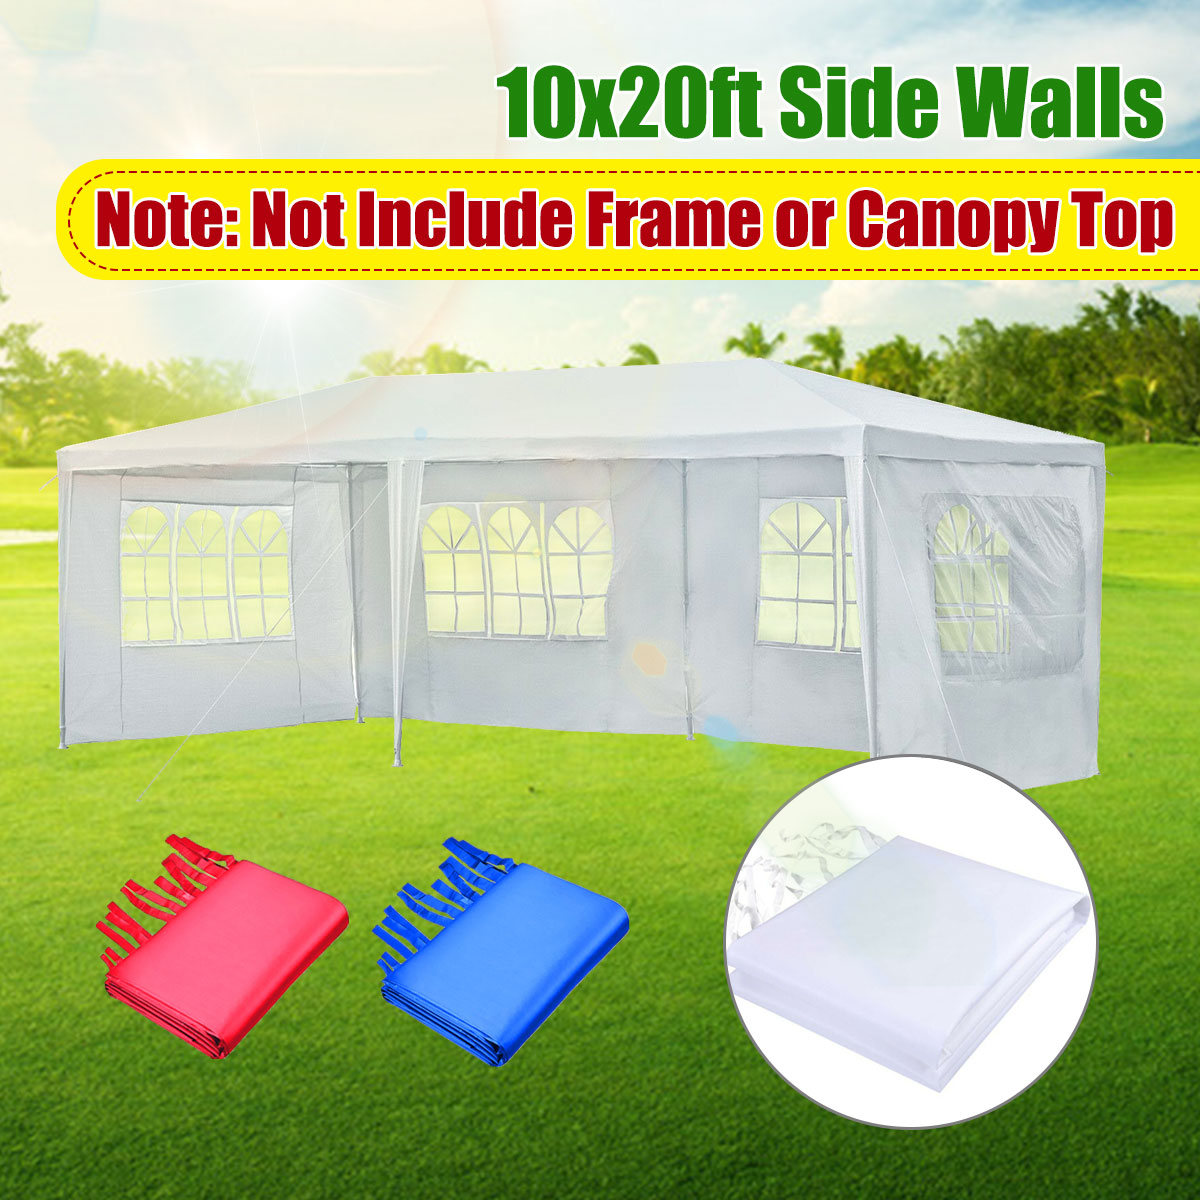 Oxford Cloth Party Tent Wall Sides Waterproof Garden Patio Outdoor Canopy 3x6m Sun Wall Sunshade Shelter Tarp Sidewall Sunshade